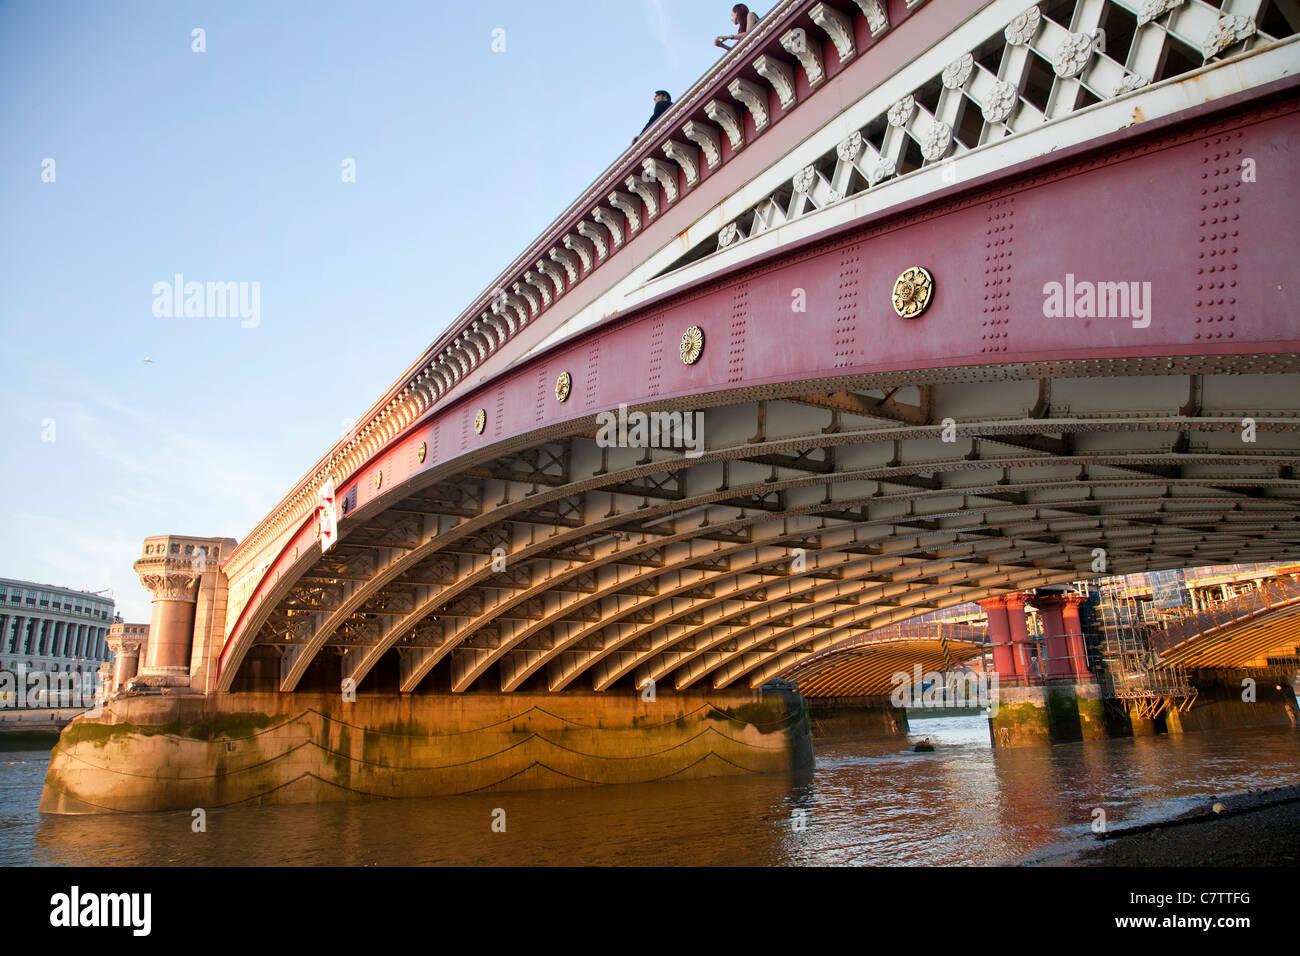 Blackfriars bridge London. Crossing the river Thames. - Stock Image